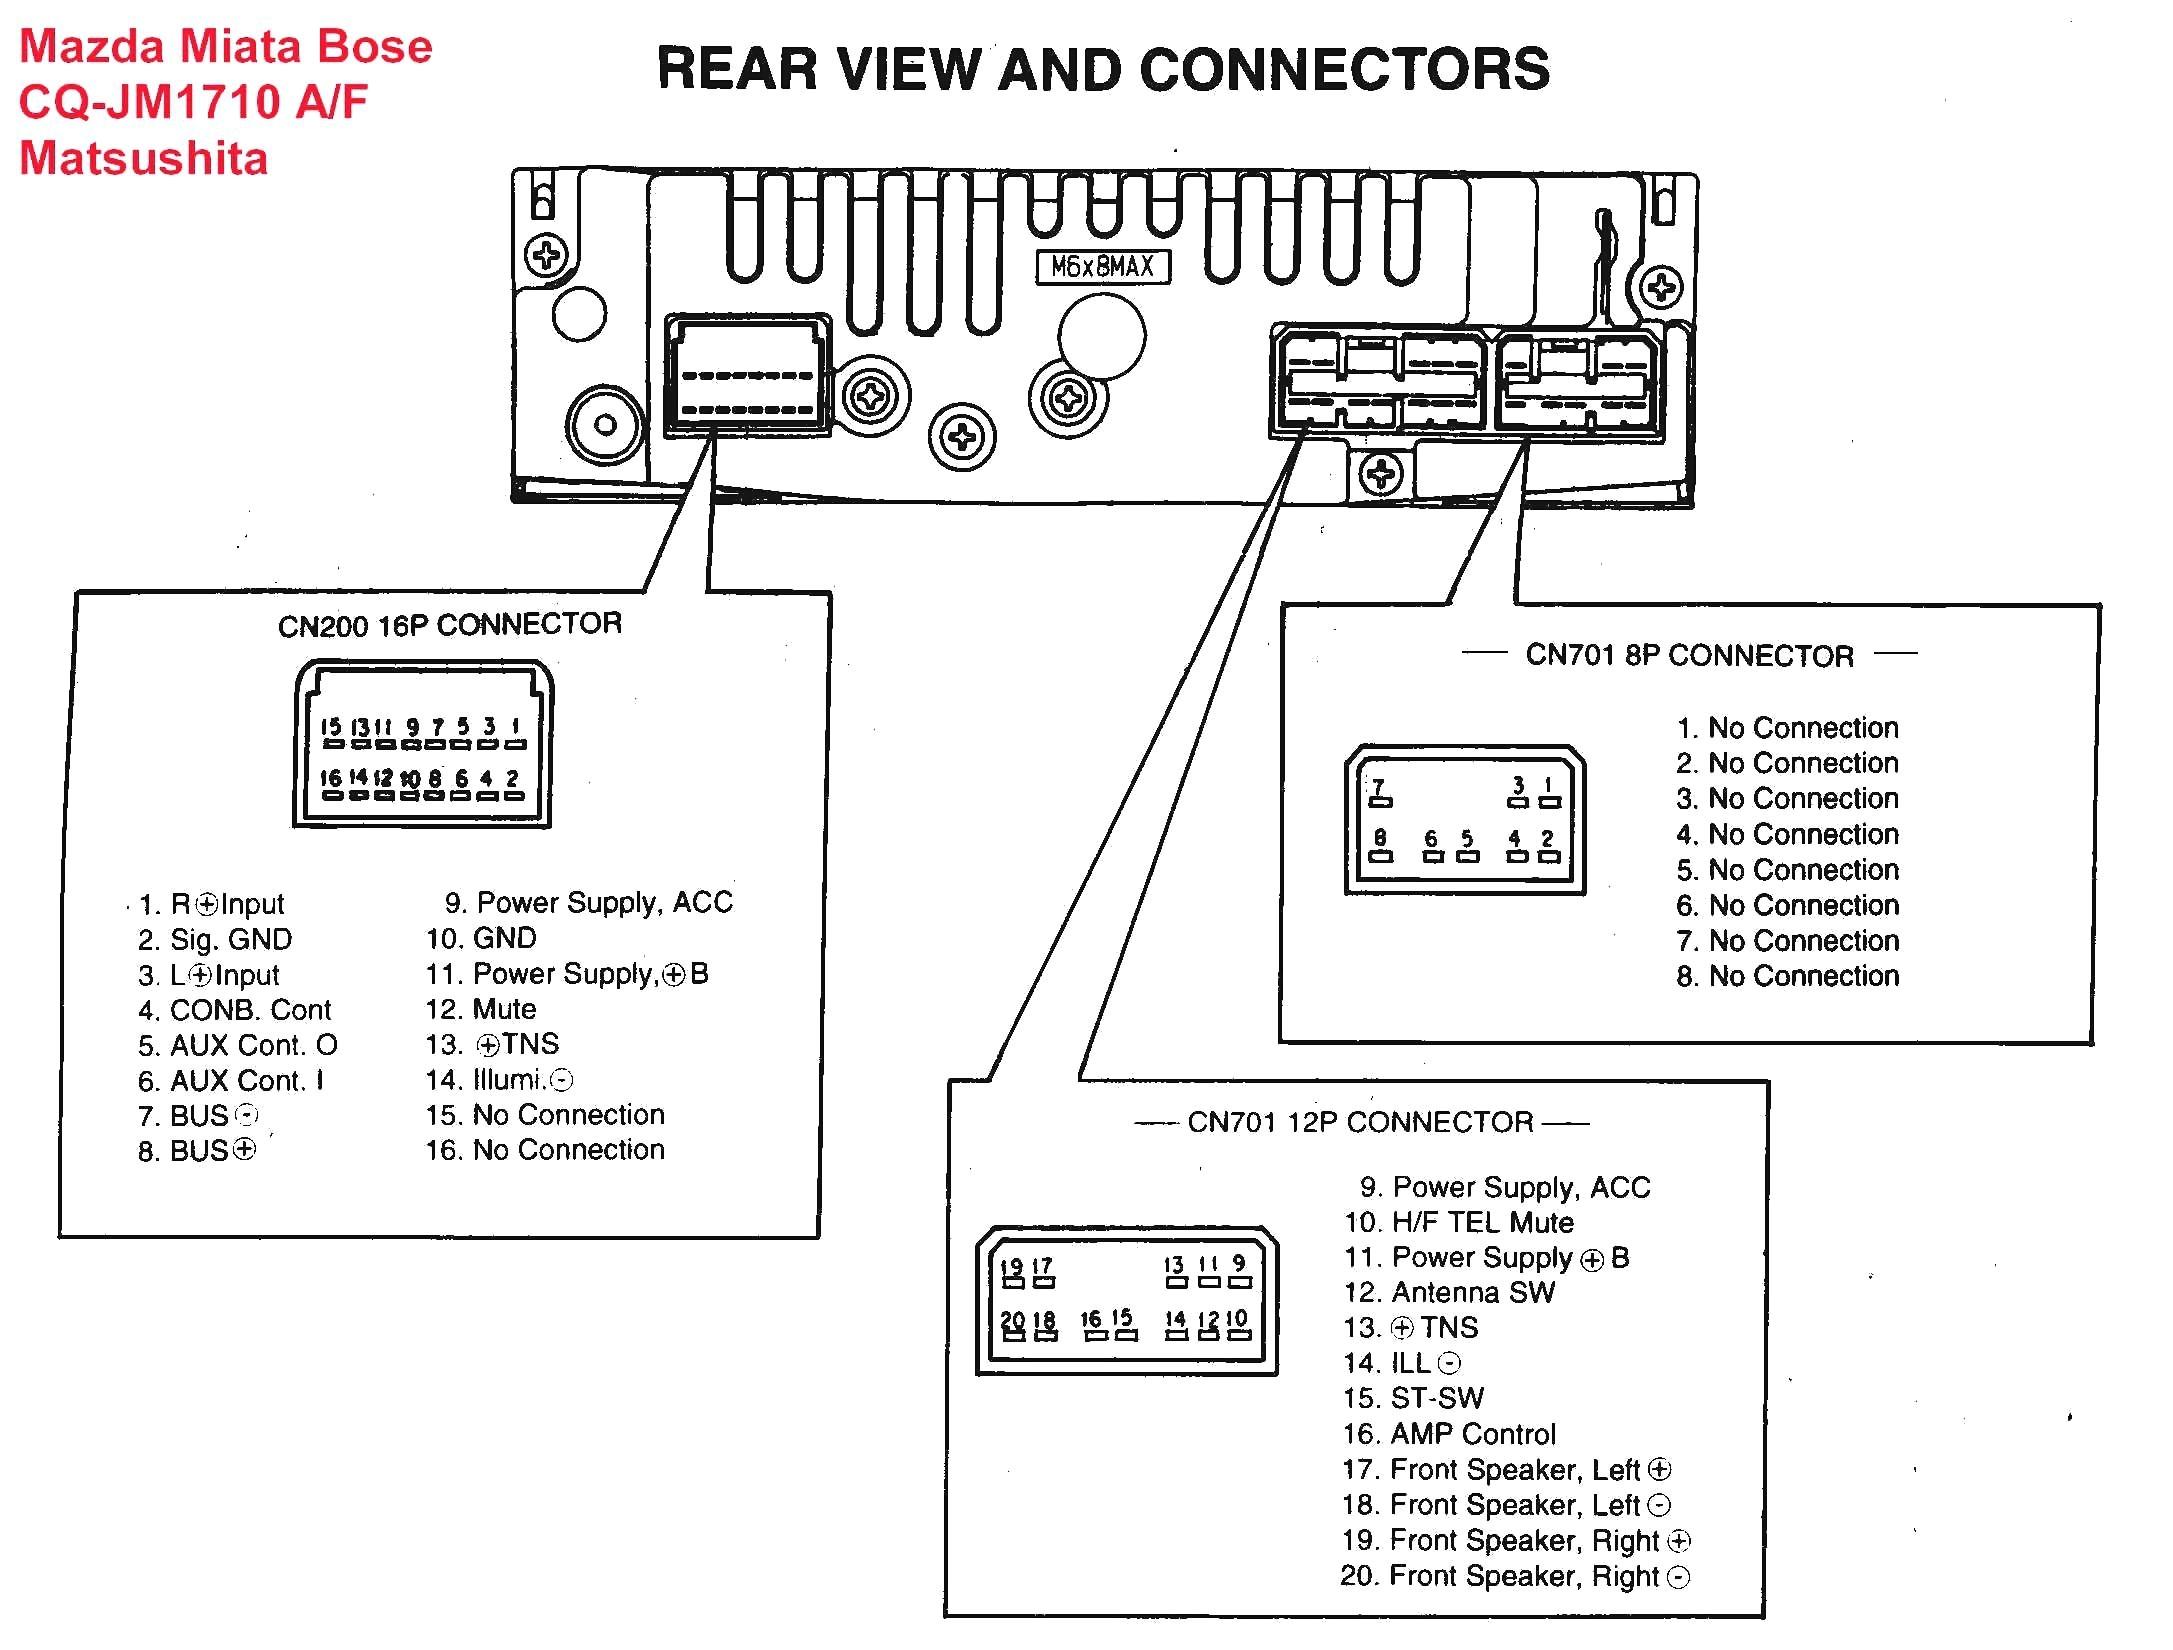 deh 1600 wiring diagram wiring diagram for you pioneer deh 16 wiring diagram